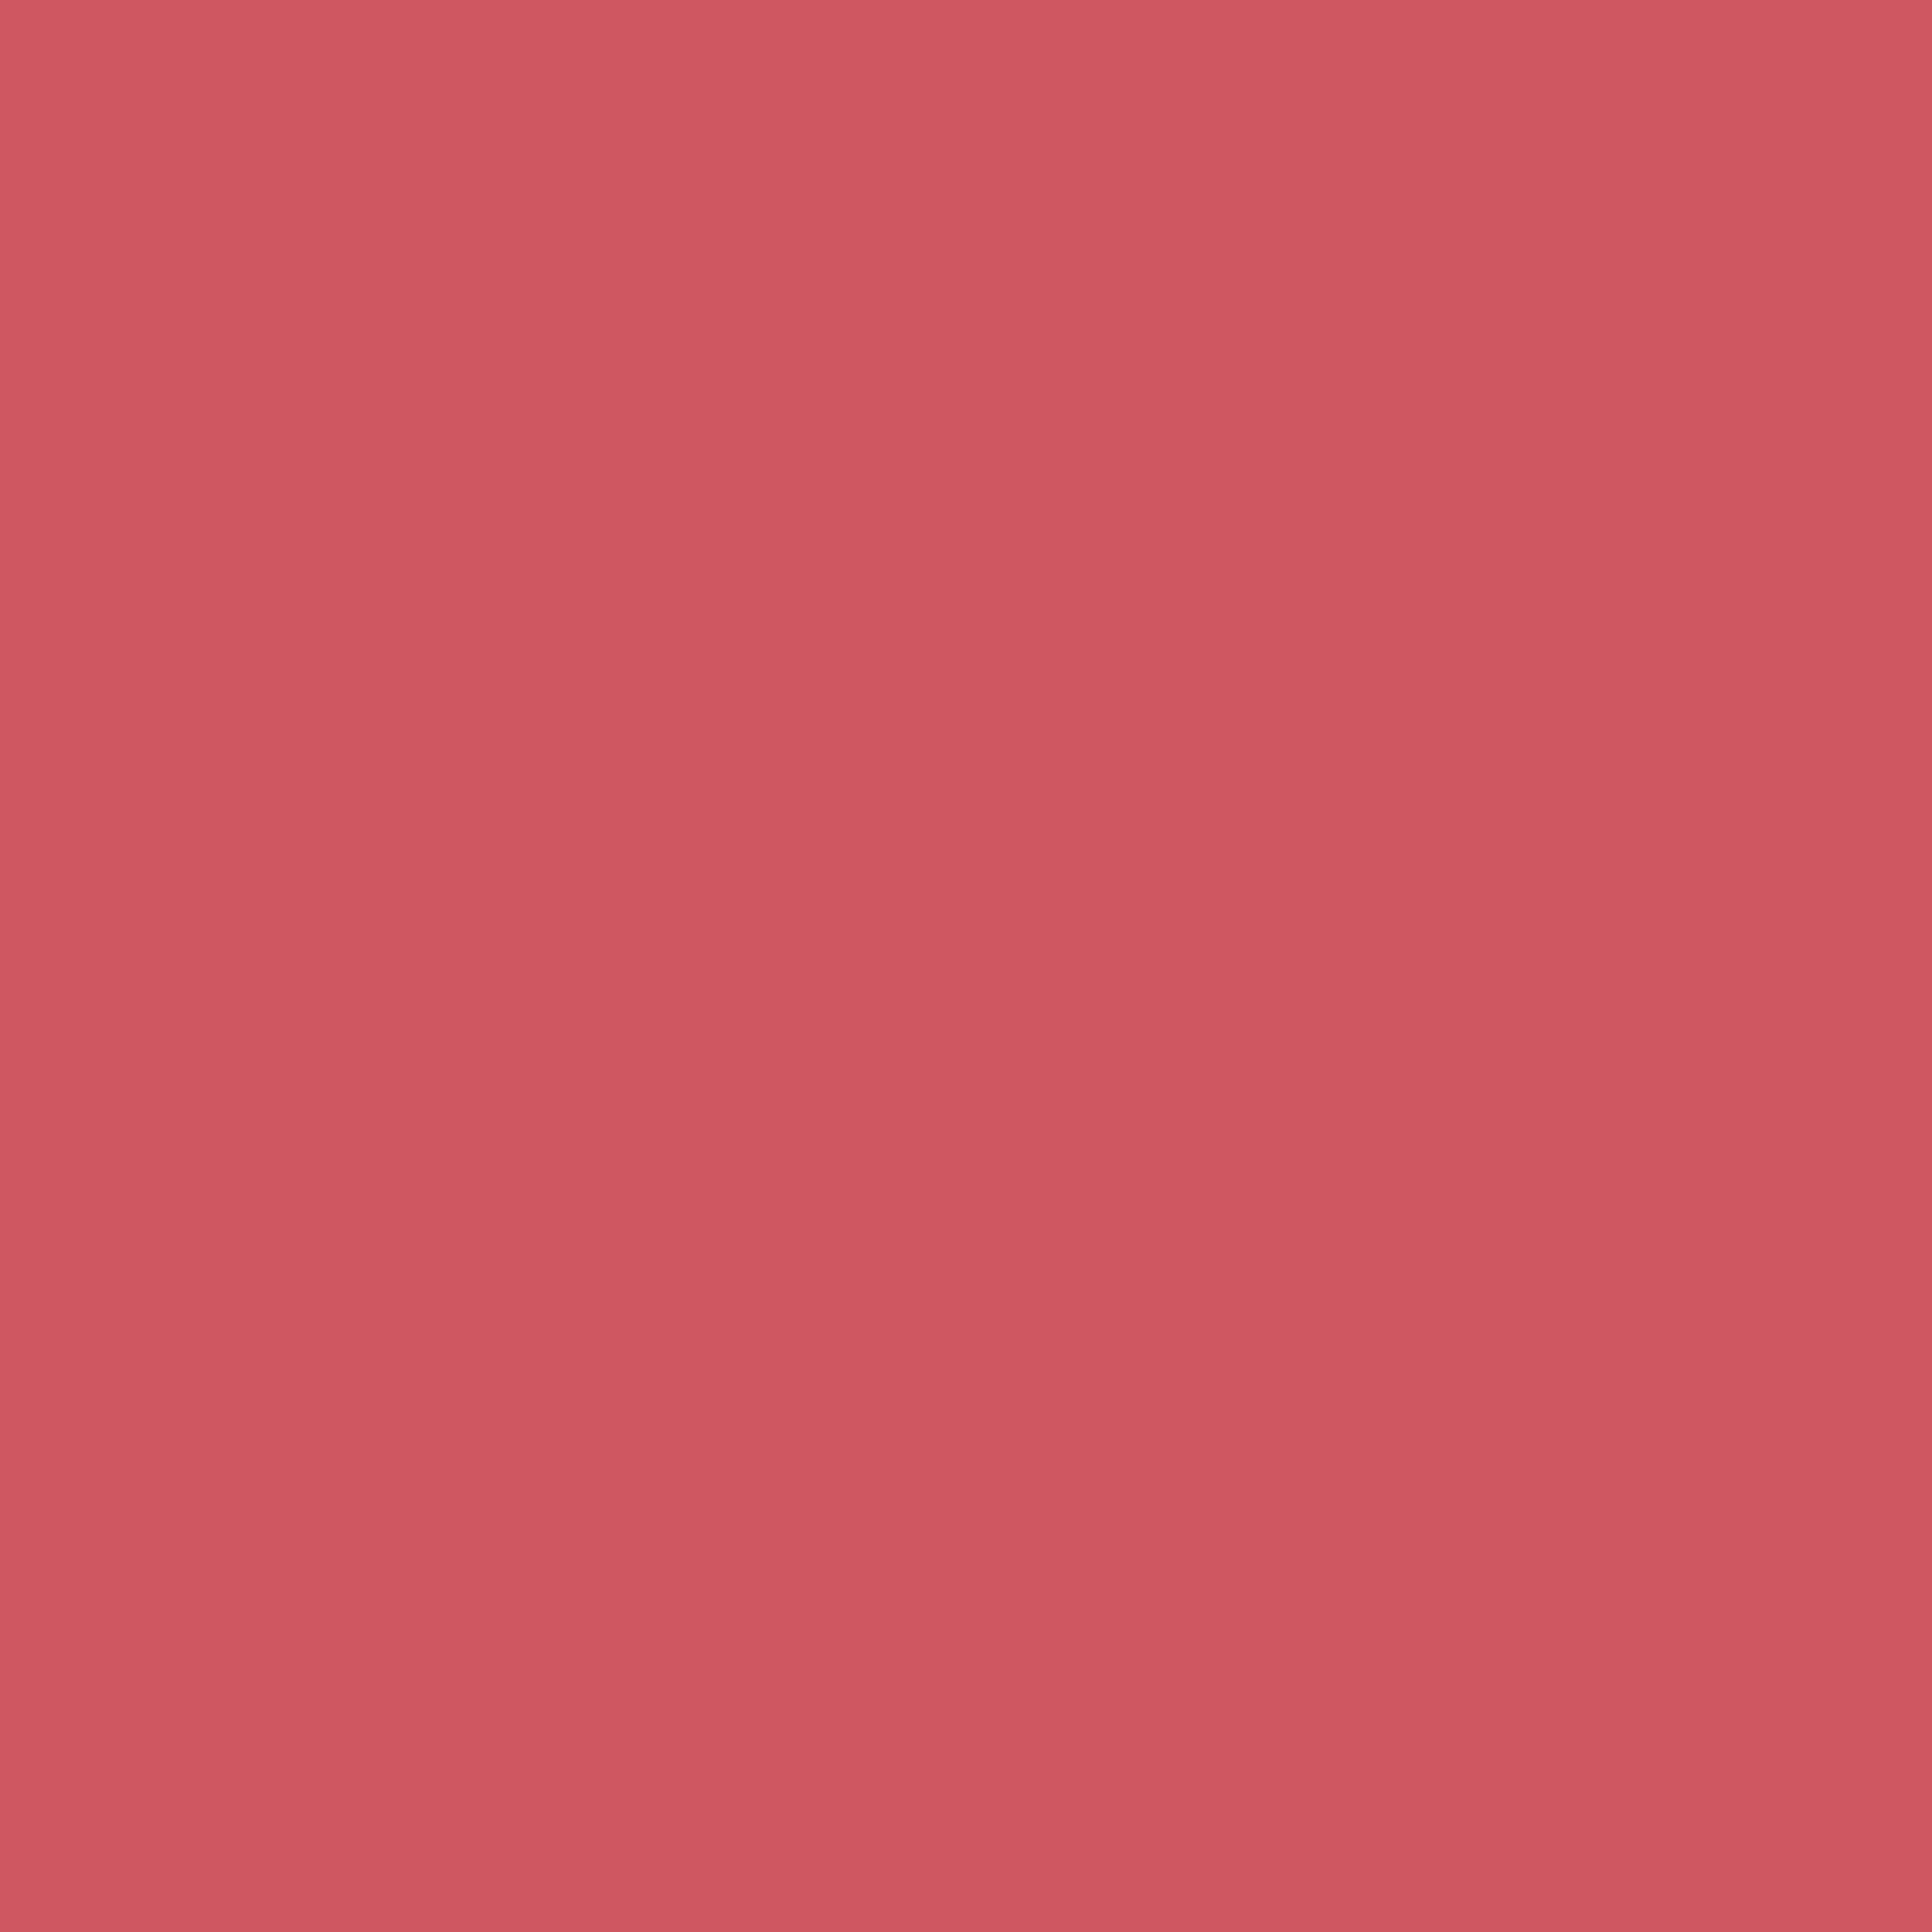 Dark Red   HEX: #CC5760   RGB: 204, 87, 96   CMYK: 16, 80, 55, 2